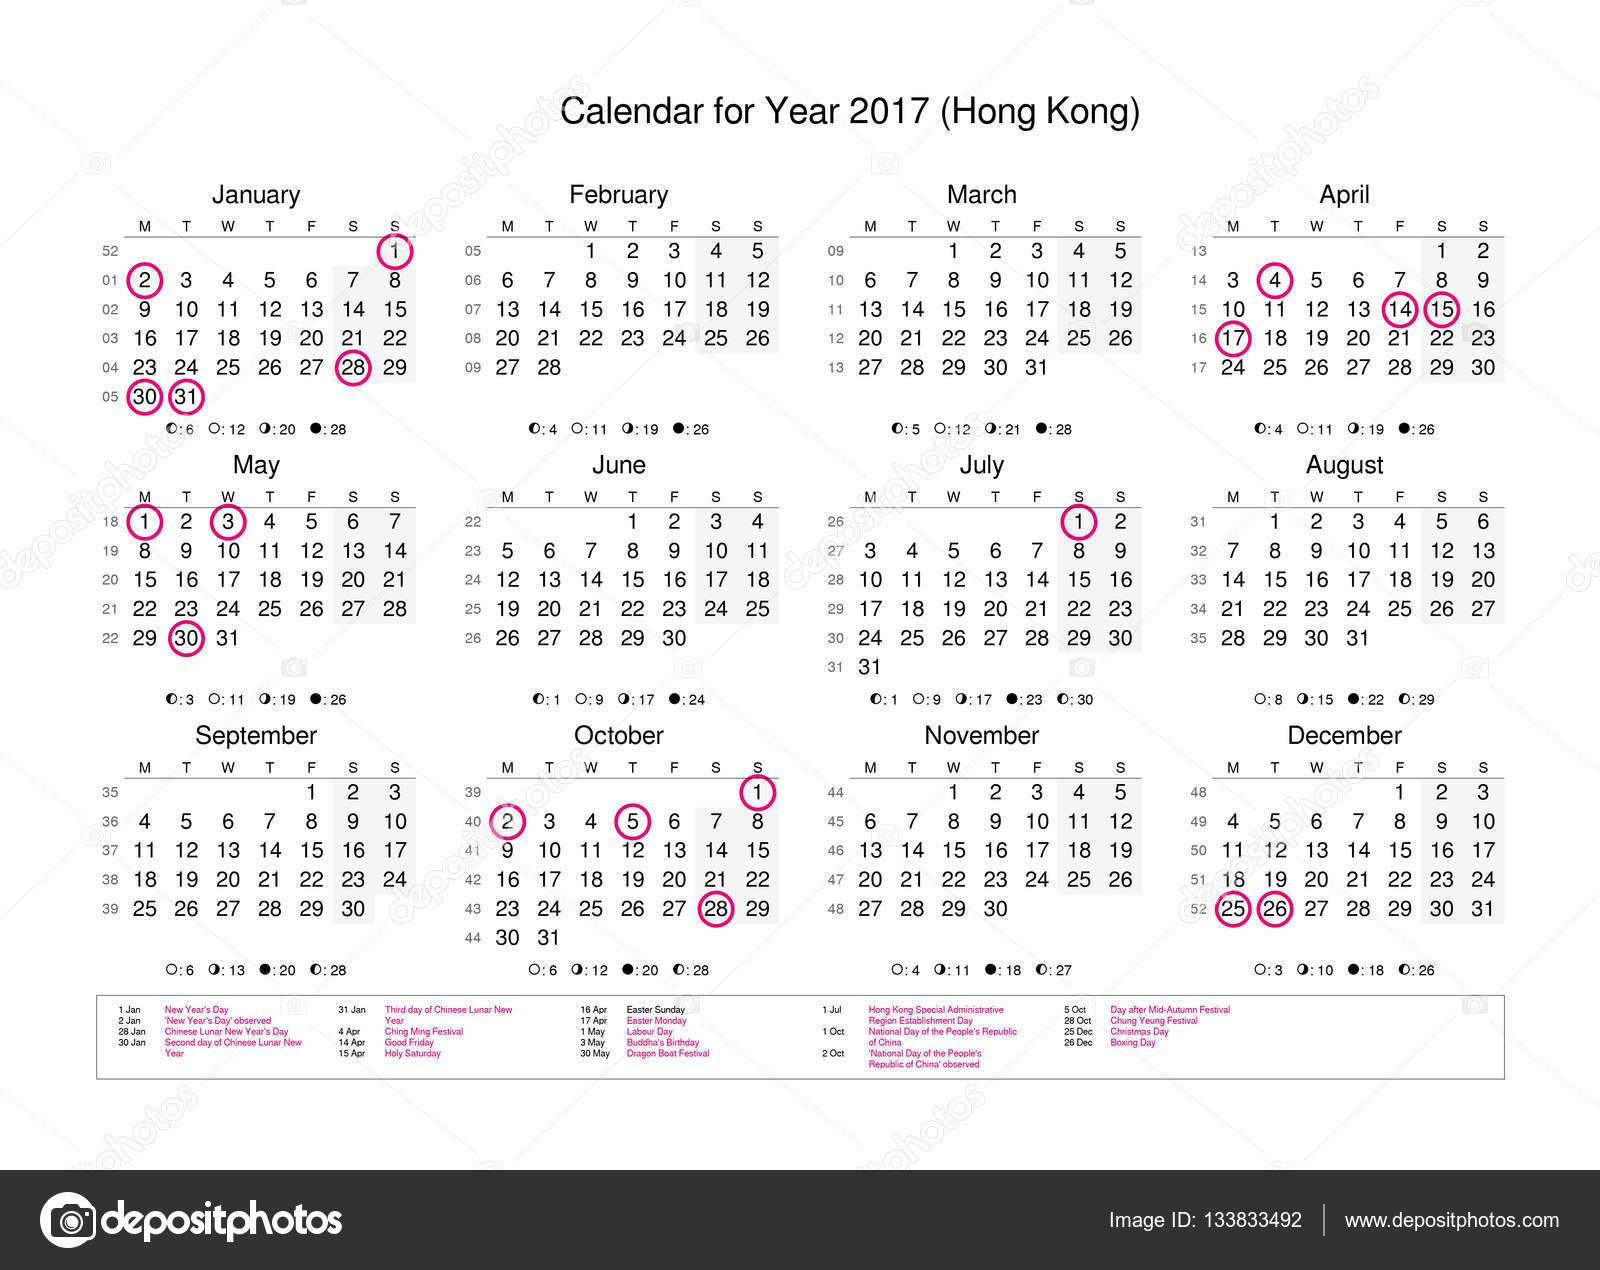 kalendar statnich svatku Kalendář roku 2017 s státních svátků a státních svátků — Stock  kalendar statnich svatku